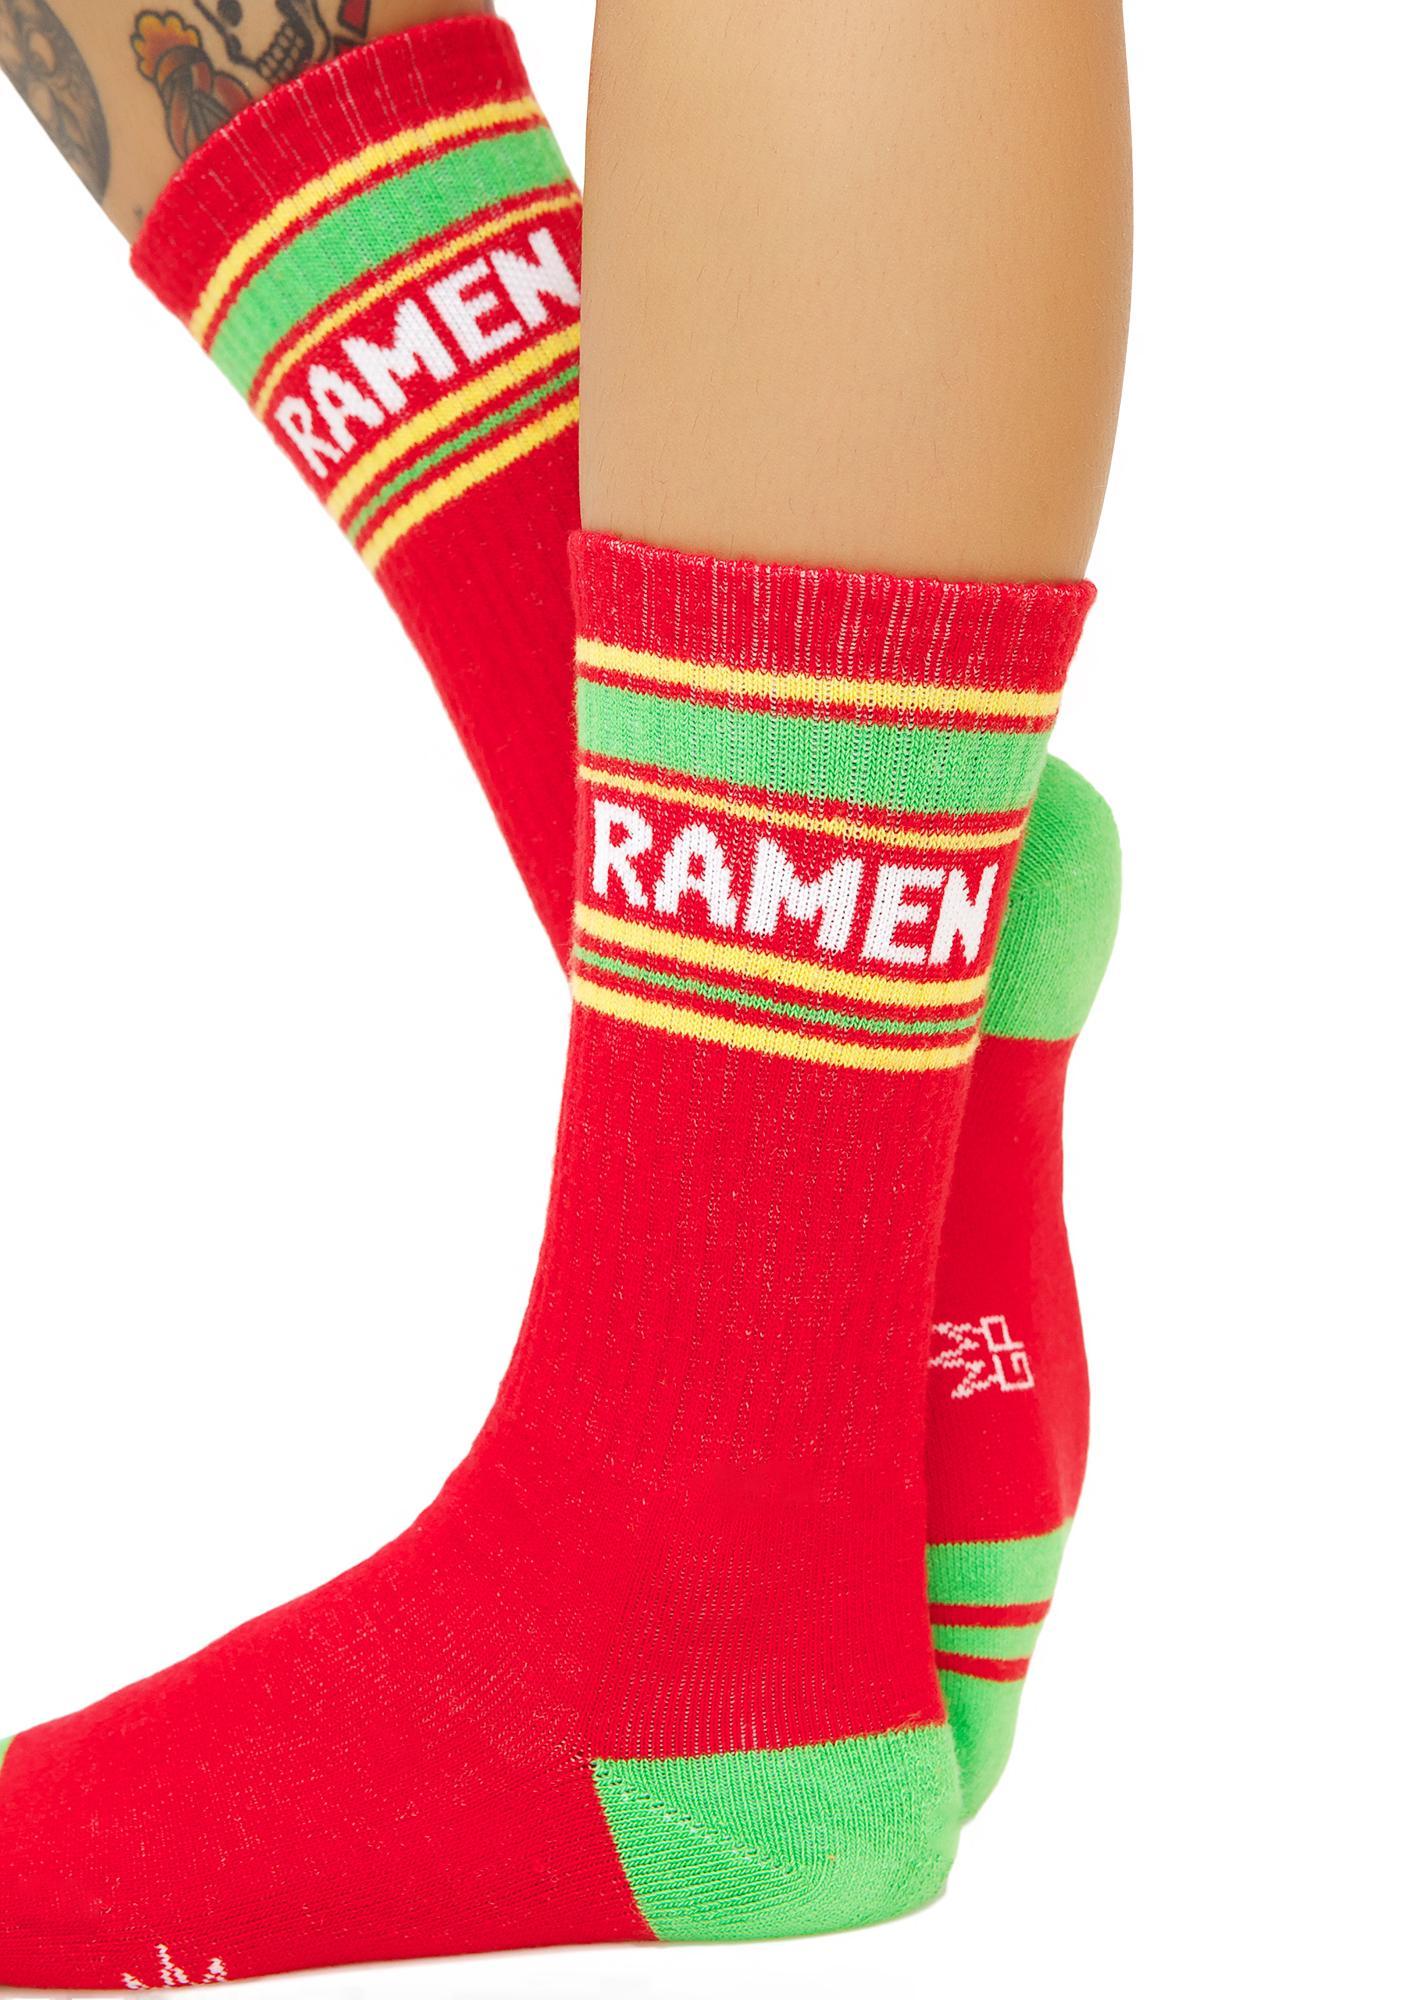 Gumball Poodle Ramen Athletic Crew Socks